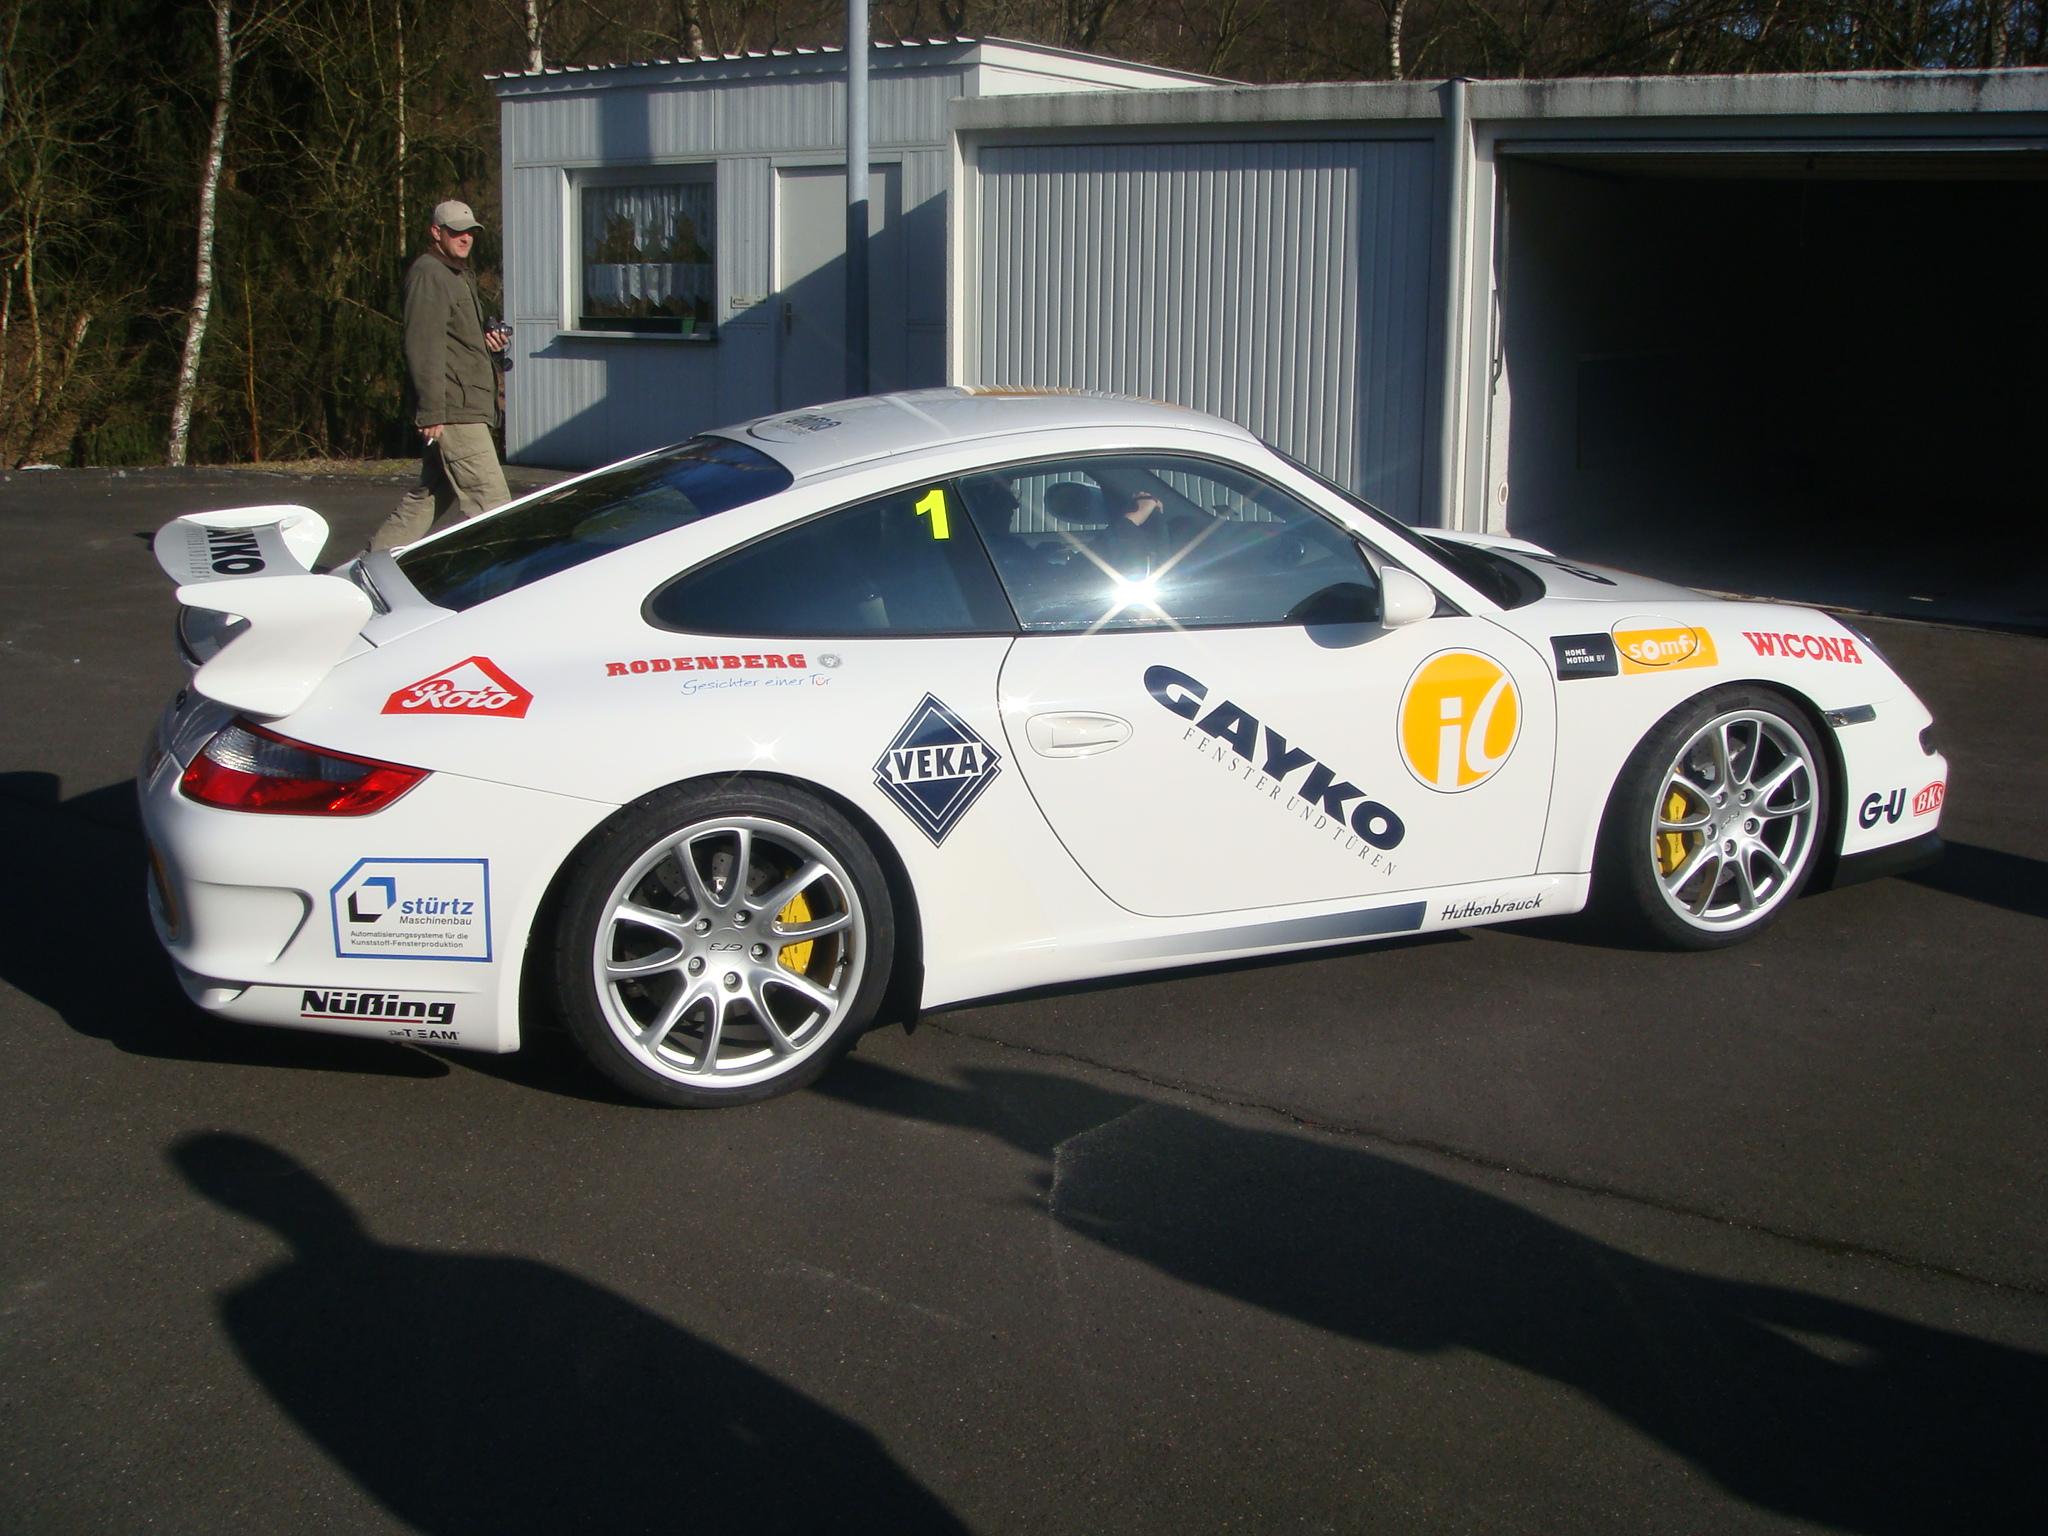 Test Drive in a Porsche GT